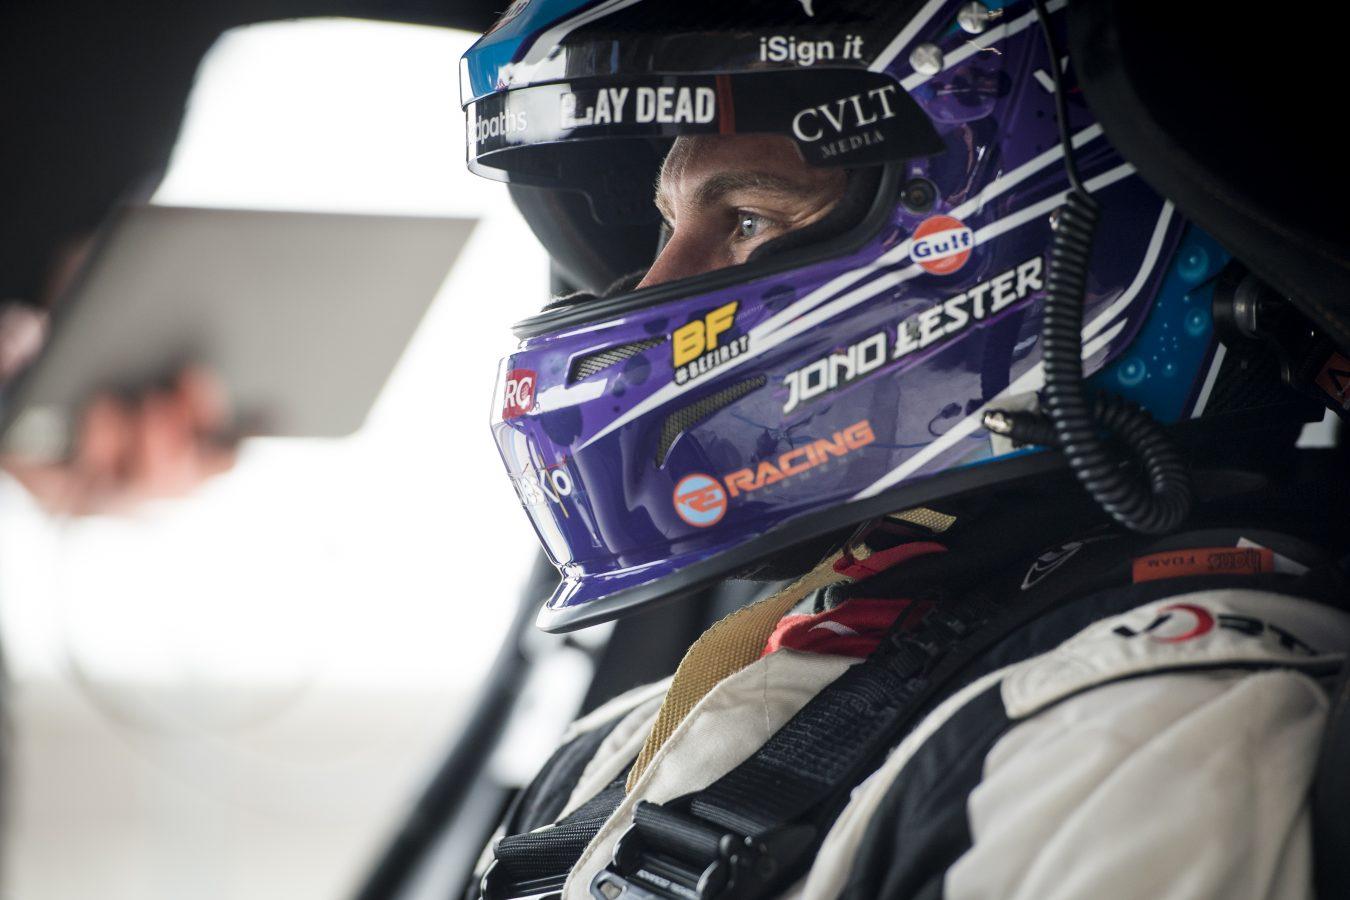 Jono Lester prepares for a race